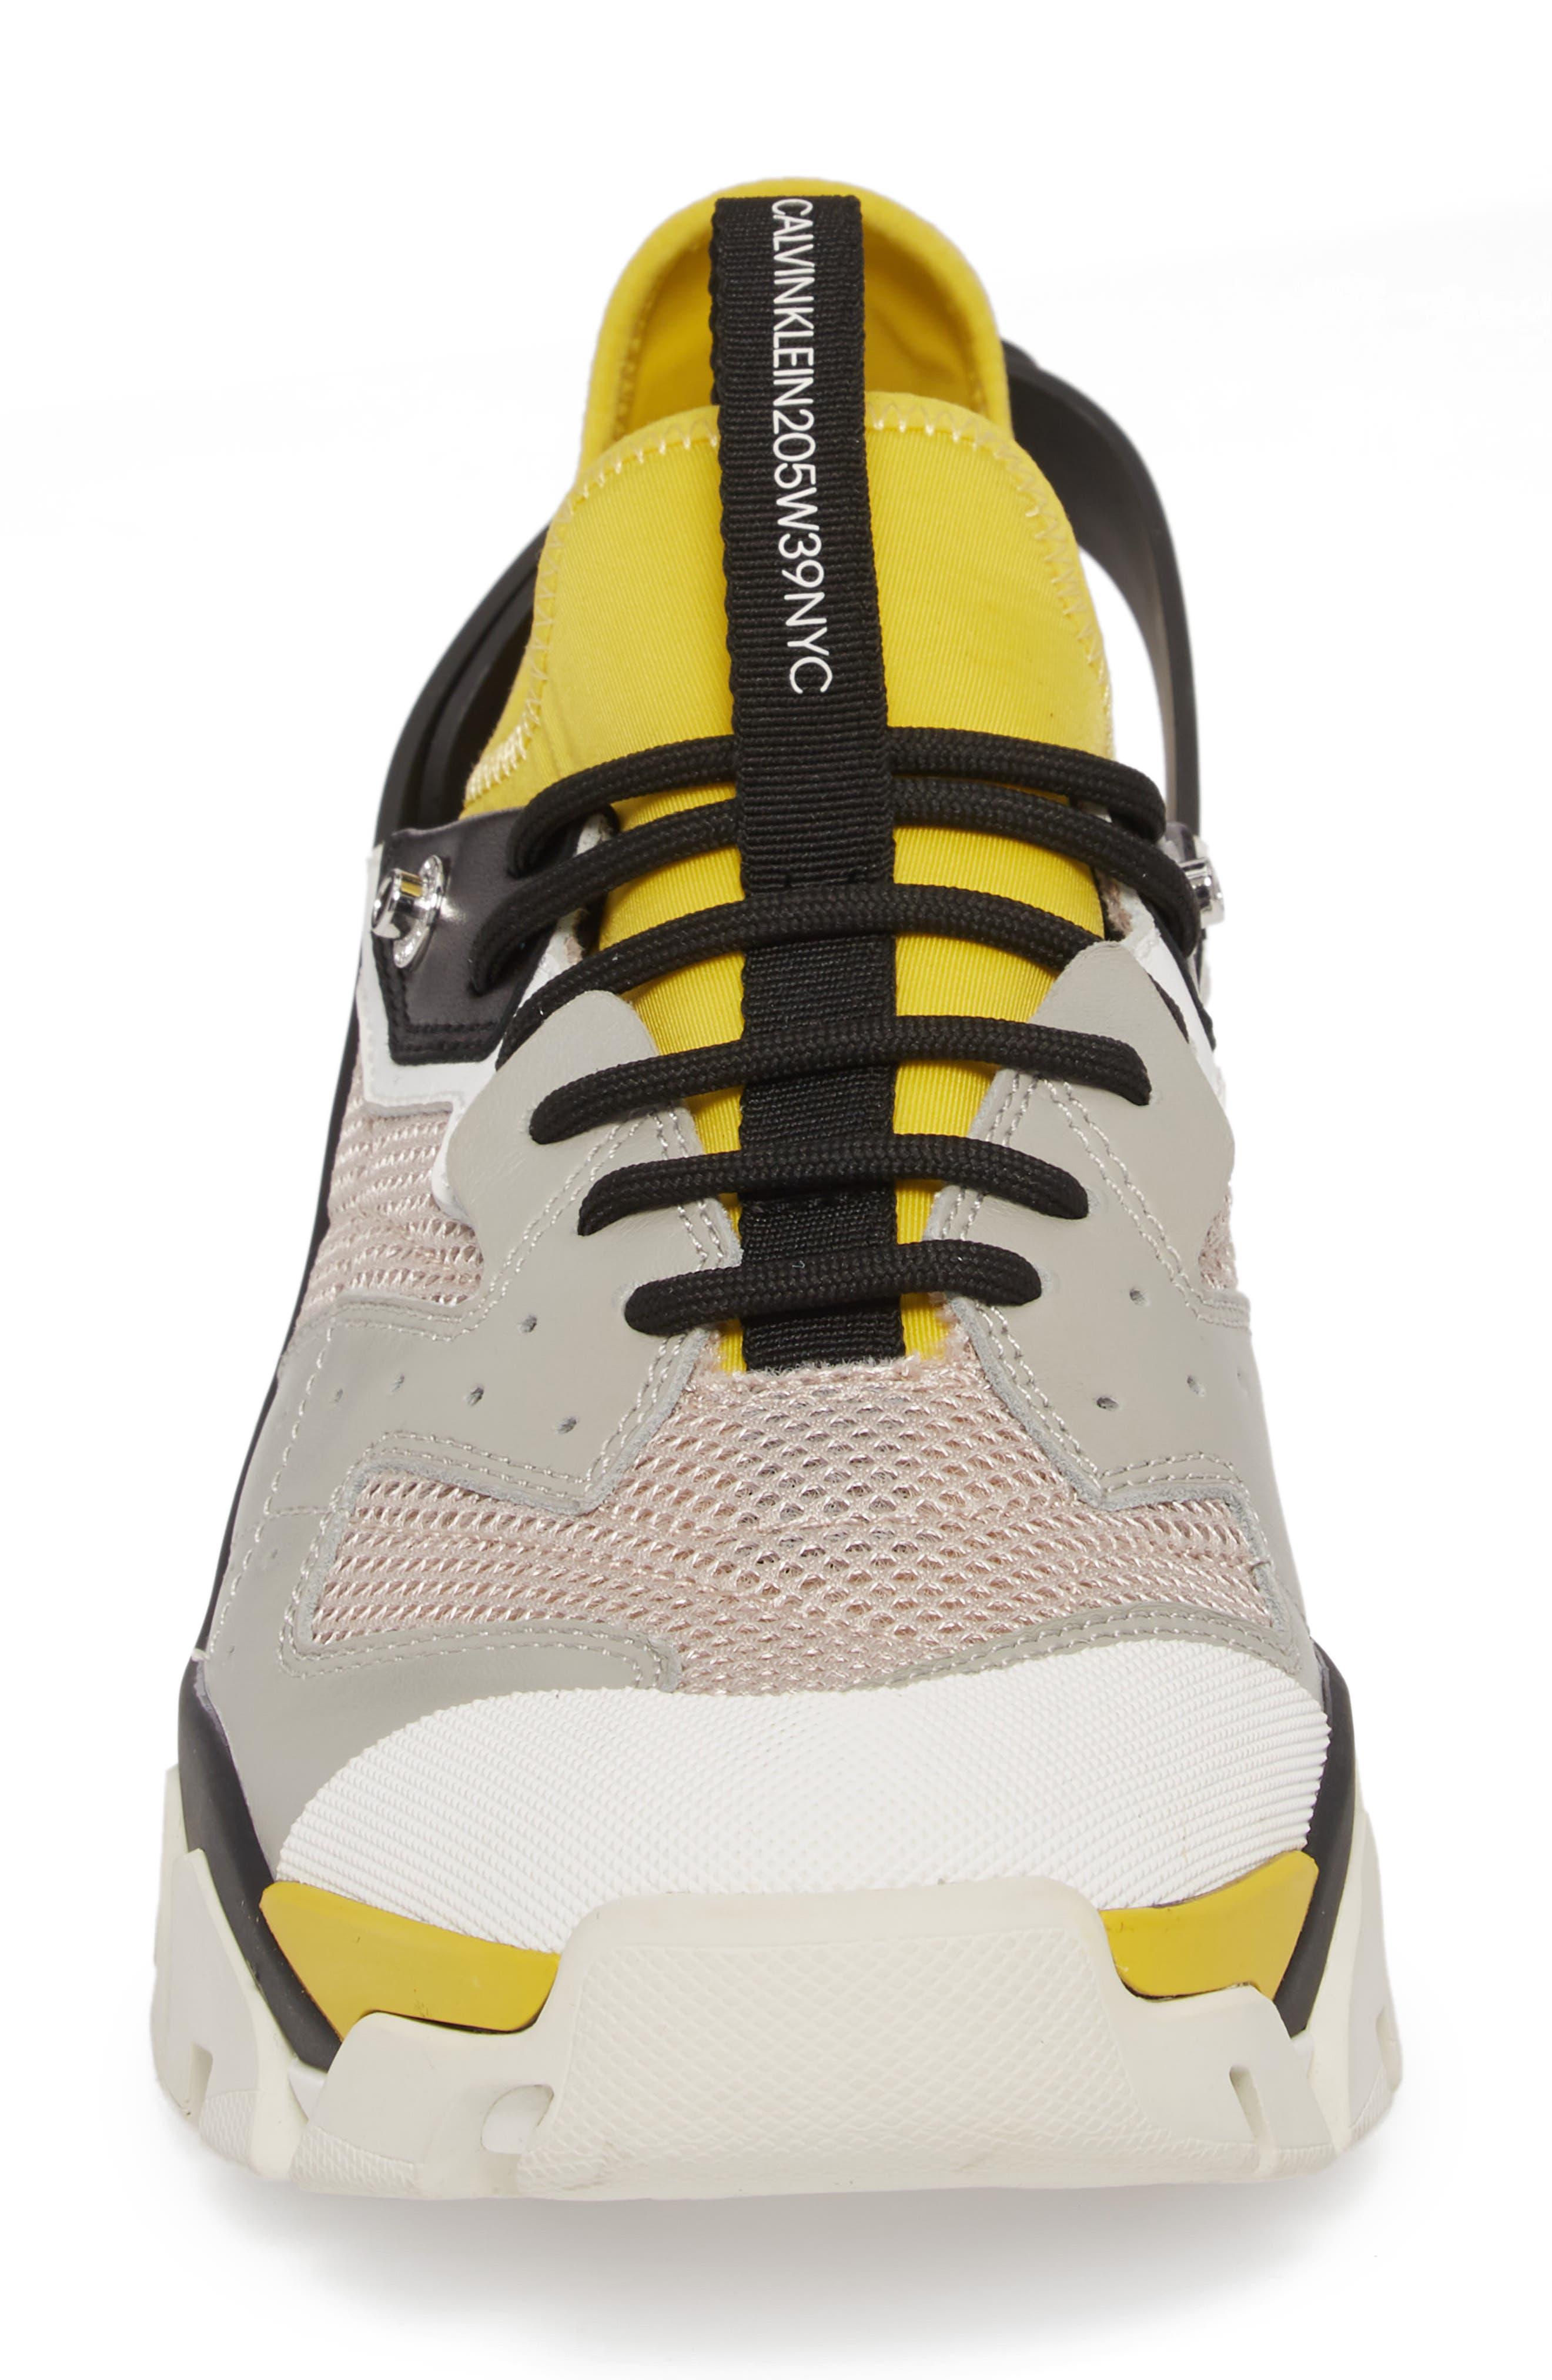 Carlos 10 Snapback Runner Sneaker,                             Alternate thumbnail 4, color,                             GREY/ YELLOW/ BLACK/ WHITE